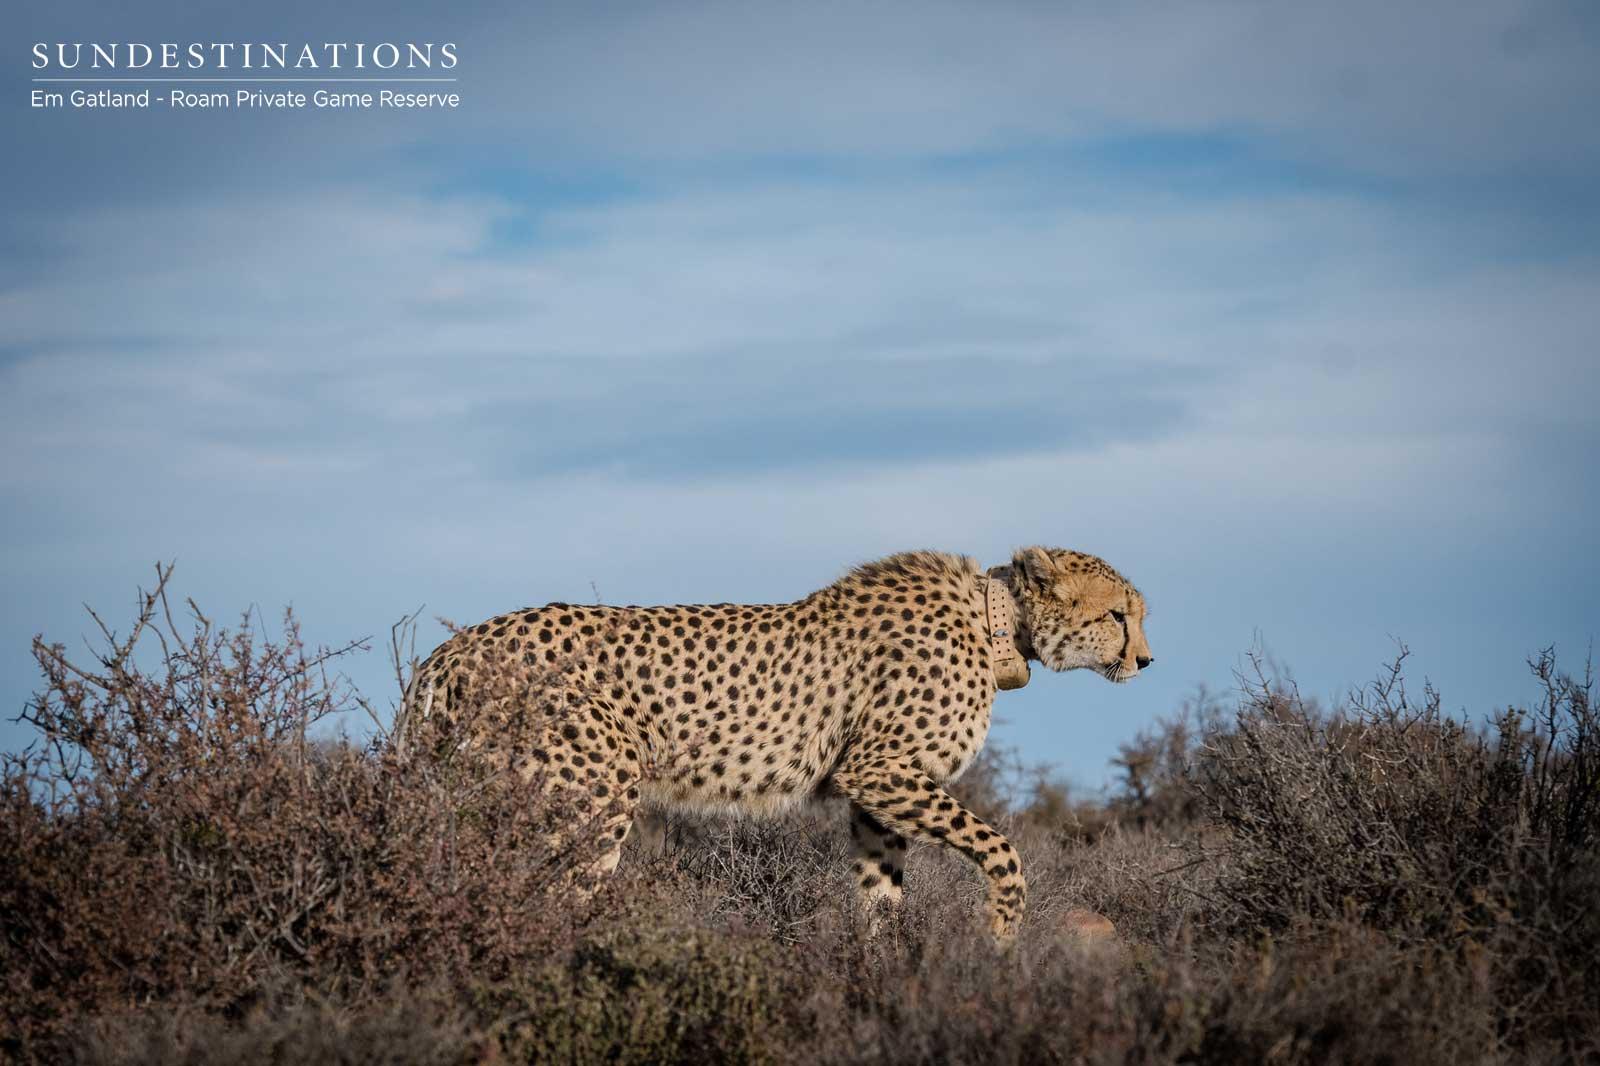 Lone Cheetah in Wilderness